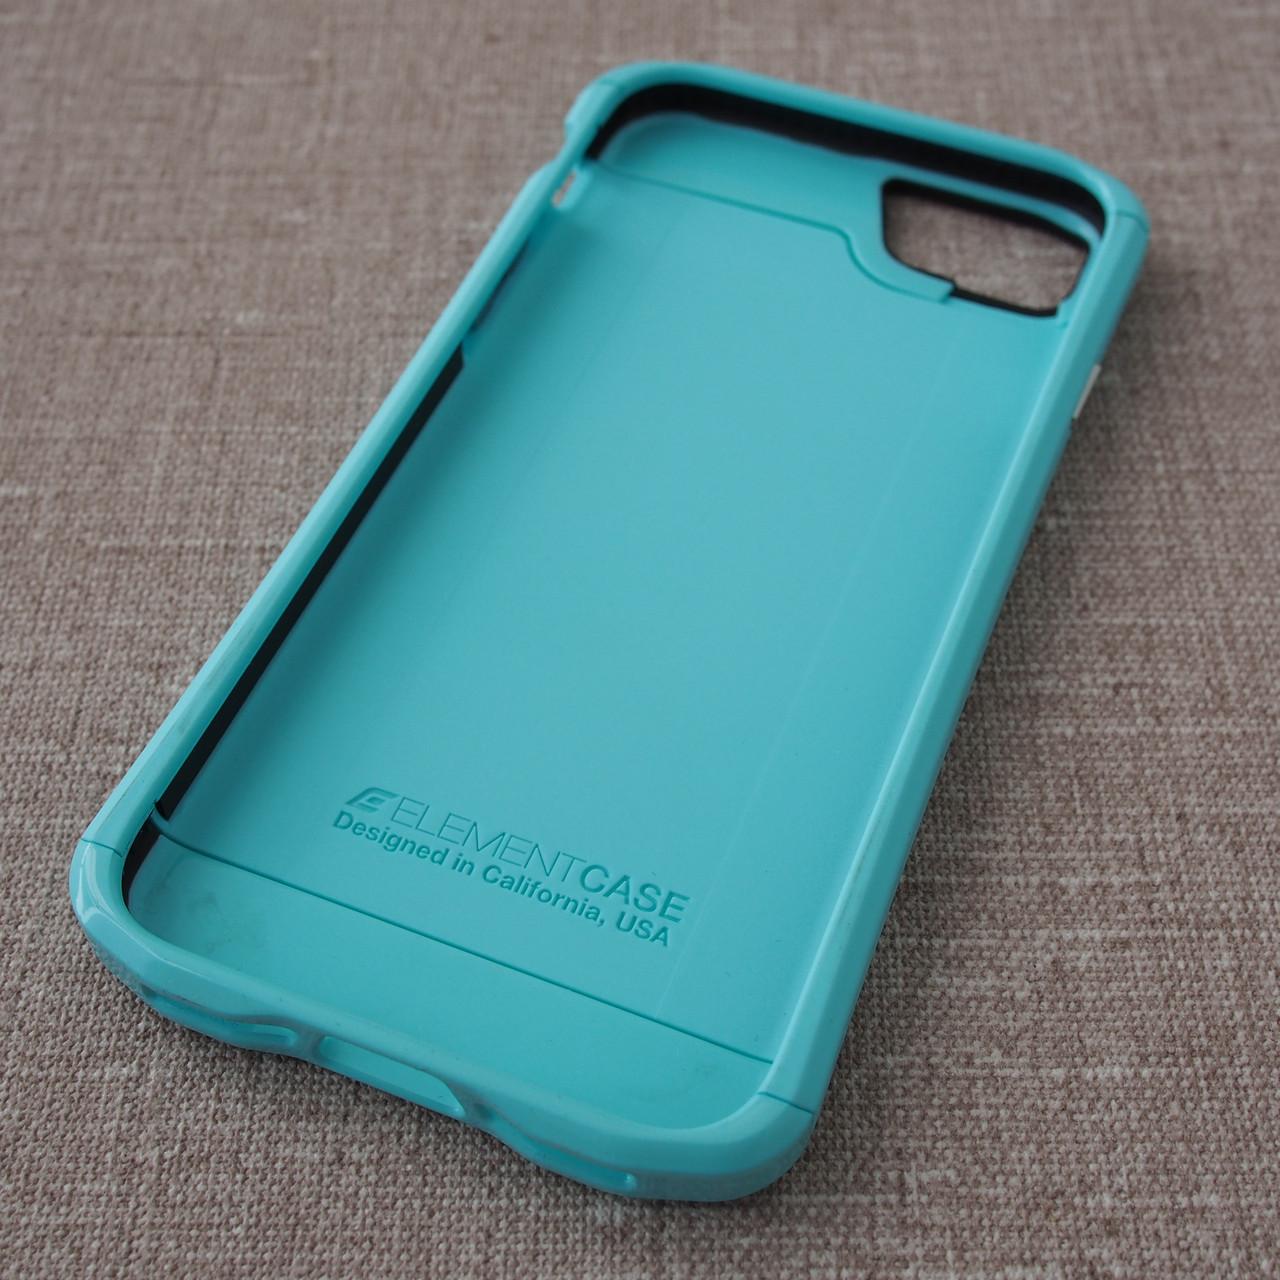 Чехол ElementCASE Aura iPhone 7 mint Для телефона Apple